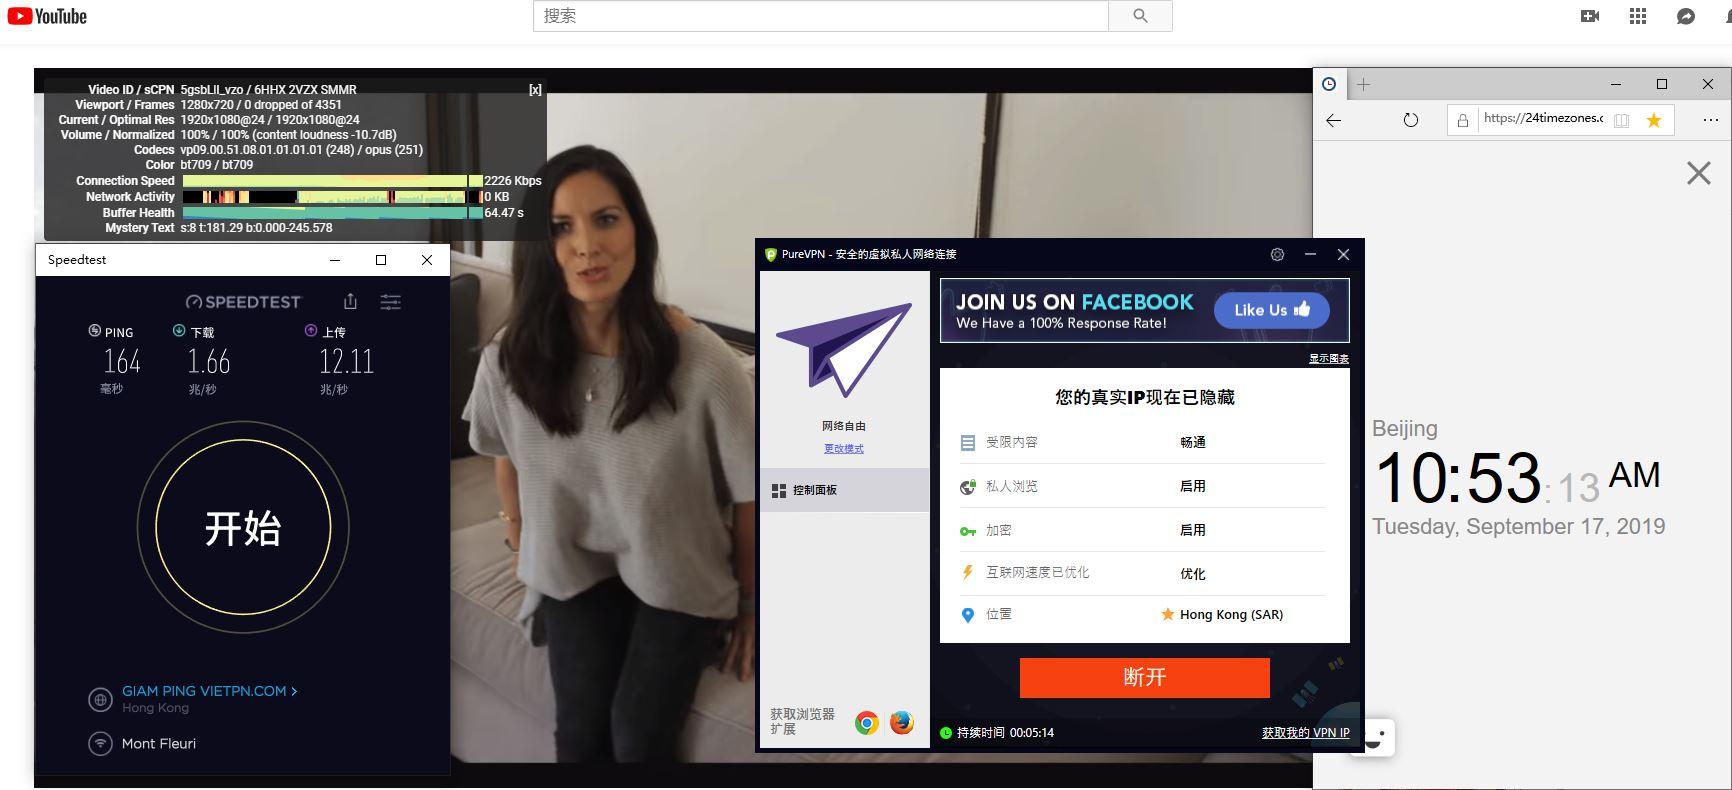 PureVPN windows Hong Kong 中国VPN翻墙 科学上网 YouTube连接速度测试-20190917